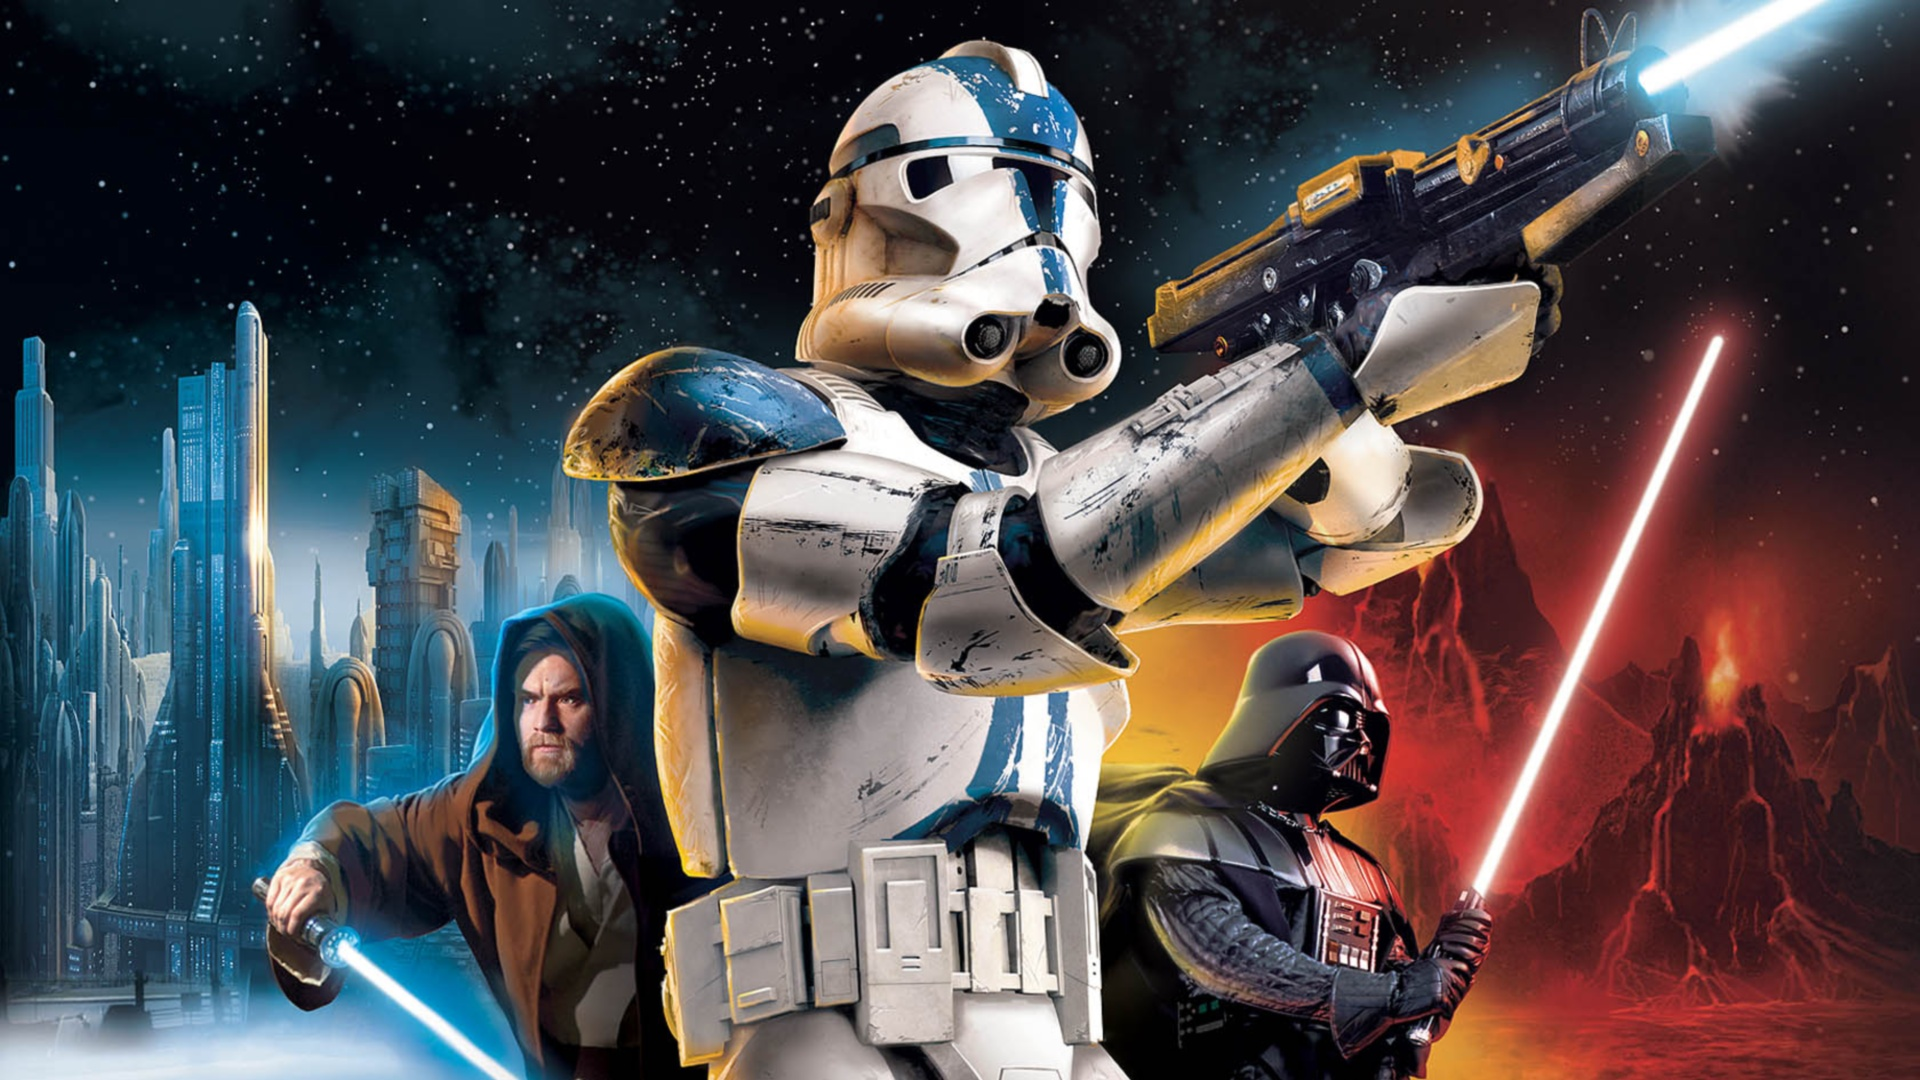 Star Wars Battlefront 2 13141 Hd Wallpaper